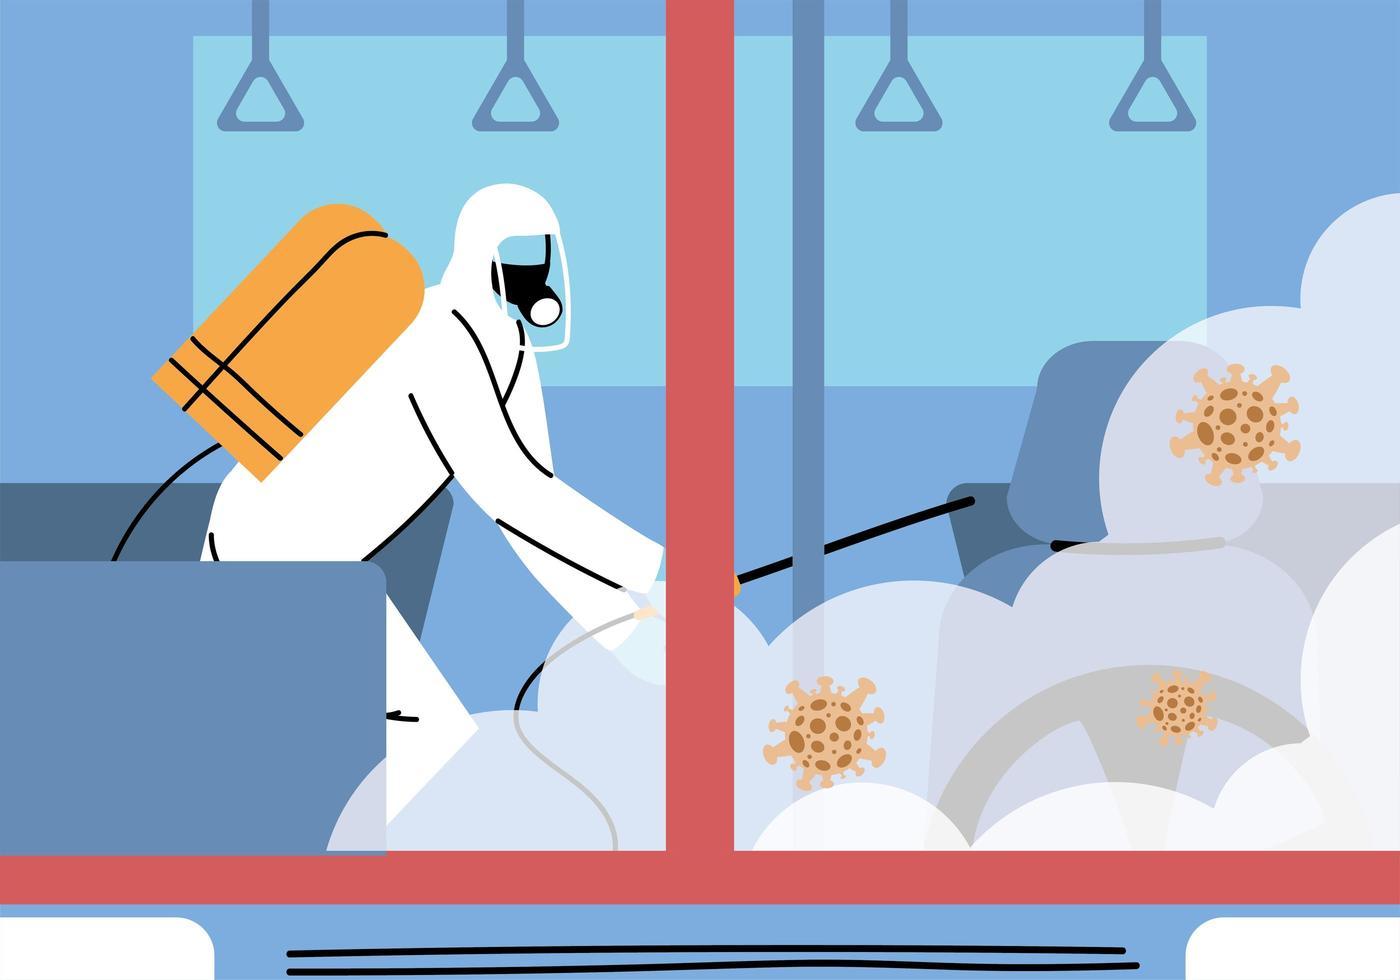 service metro desinfectie van coronavirus of covid 19 vector